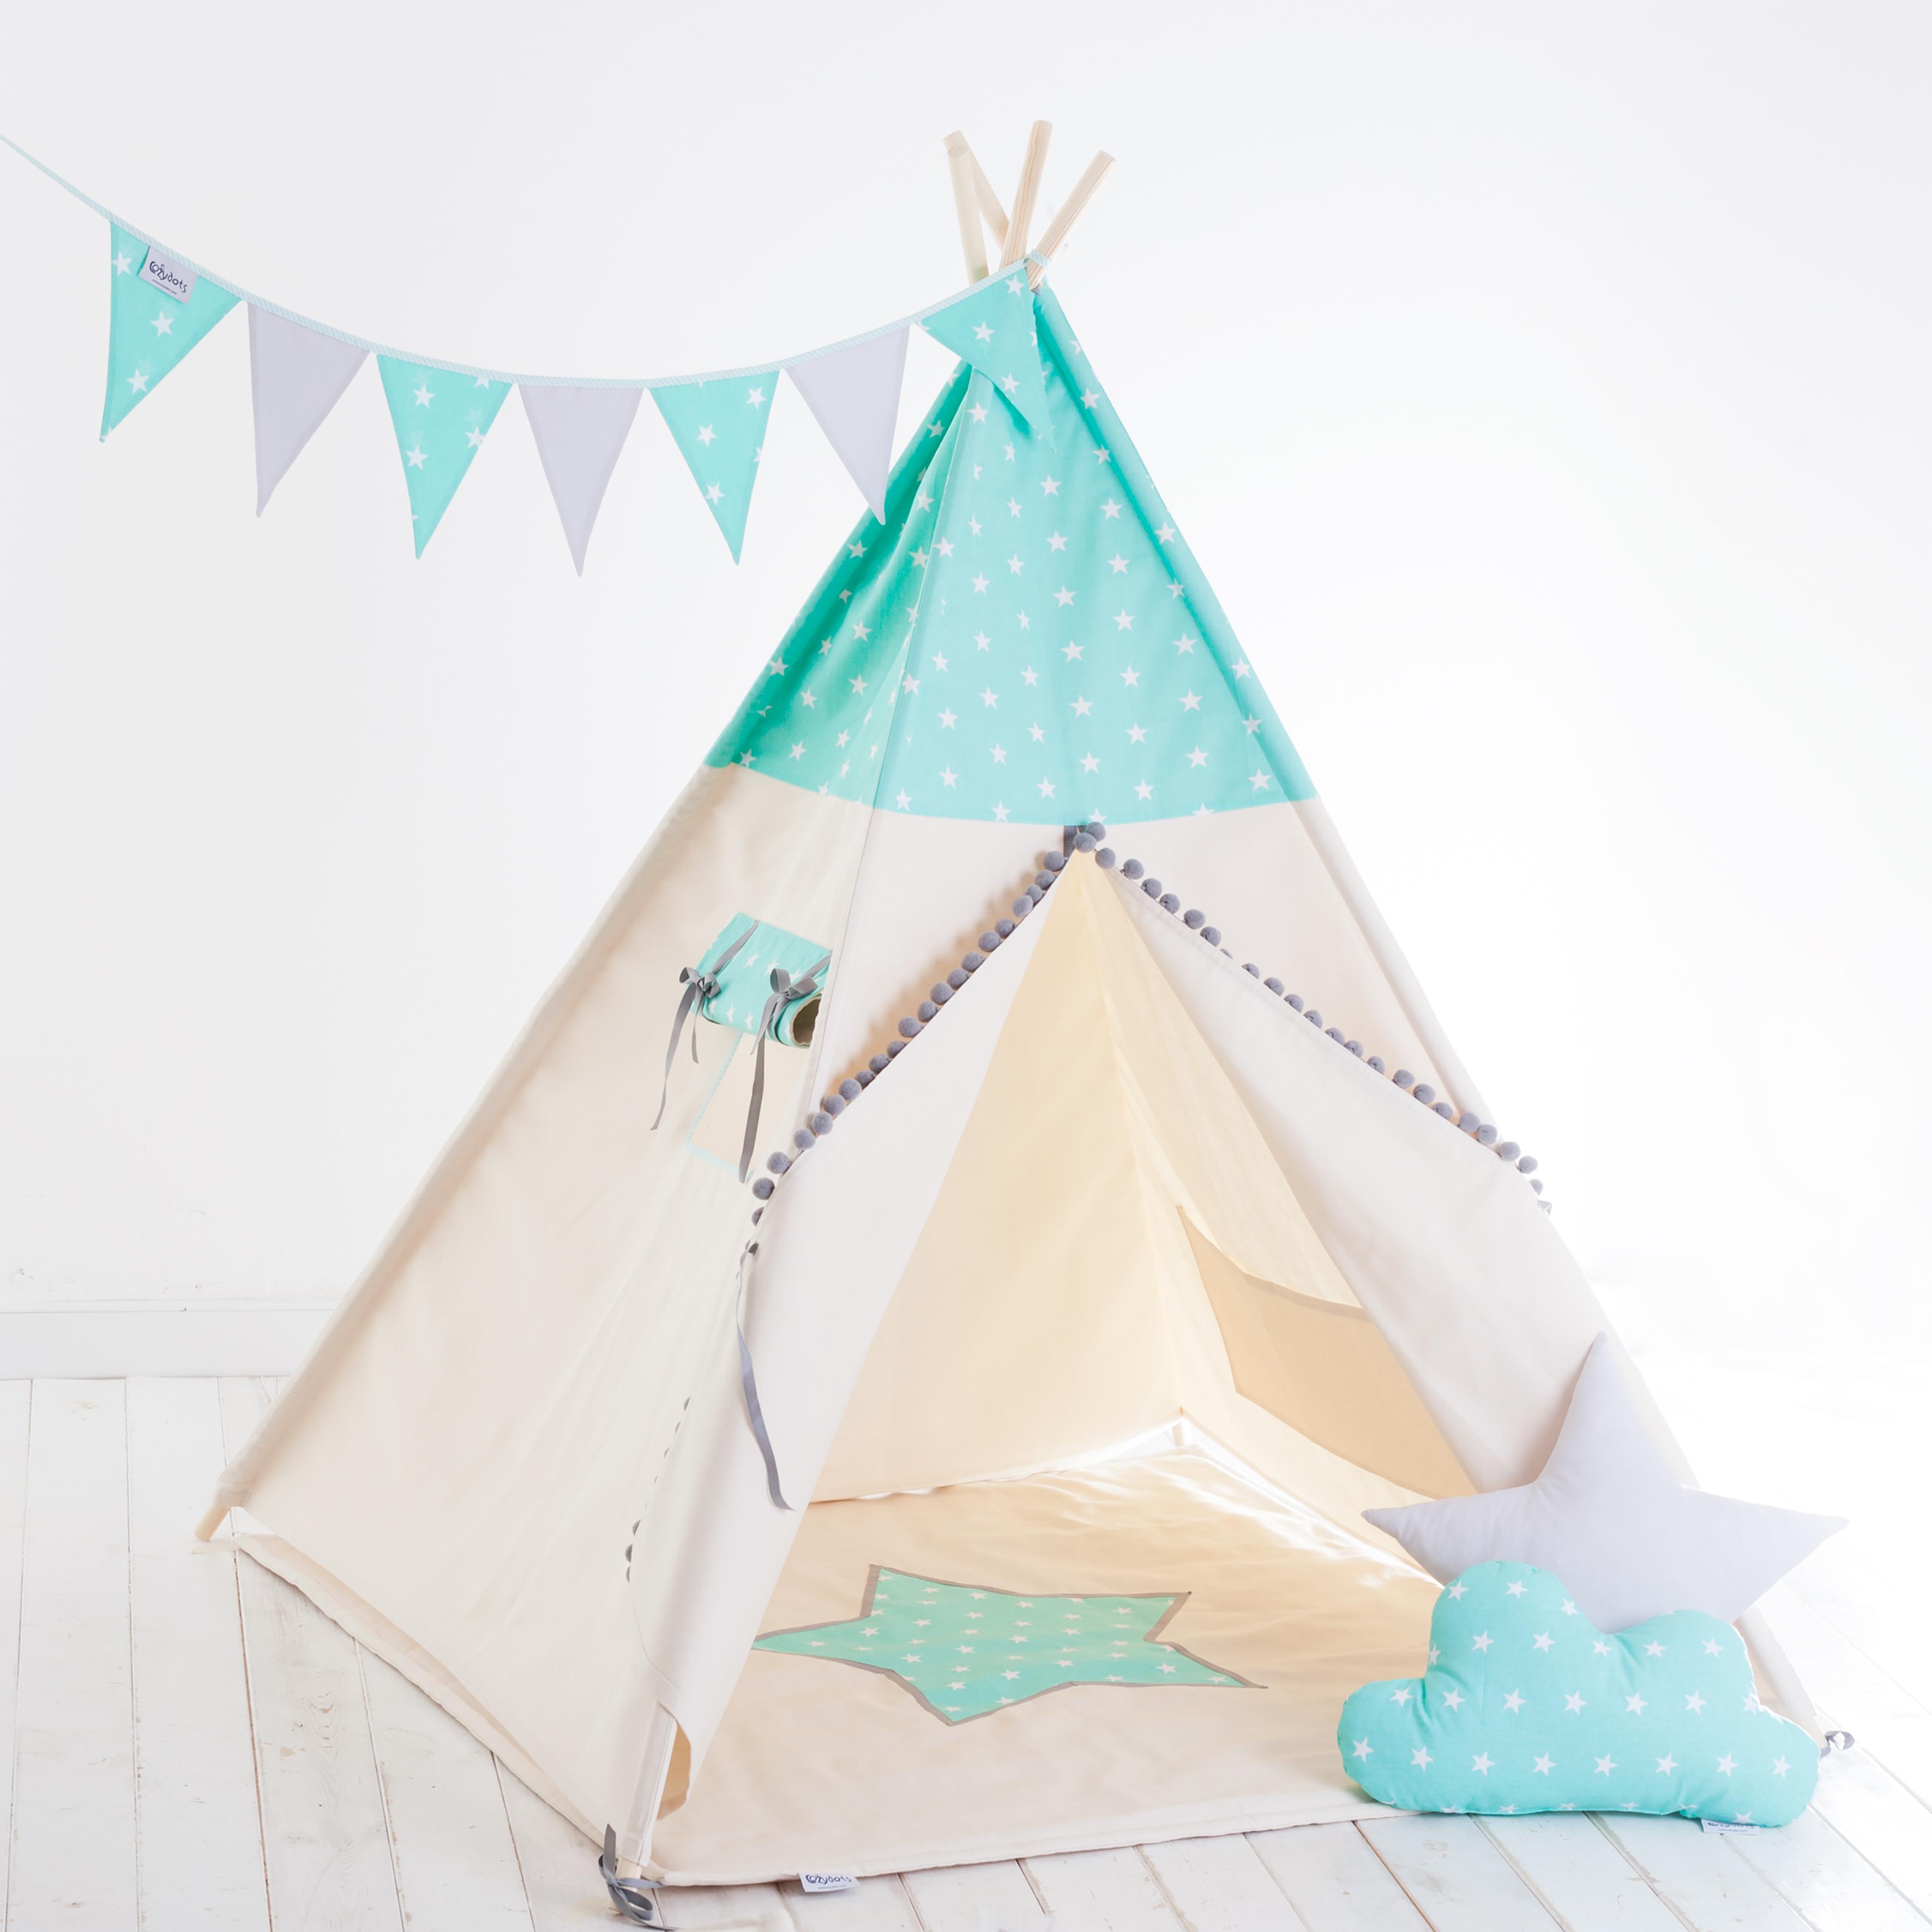 ensemble tipi indien tente pour gar on mint stars boy 7el. Black Bedroom Furniture Sets. Home Design Ideas